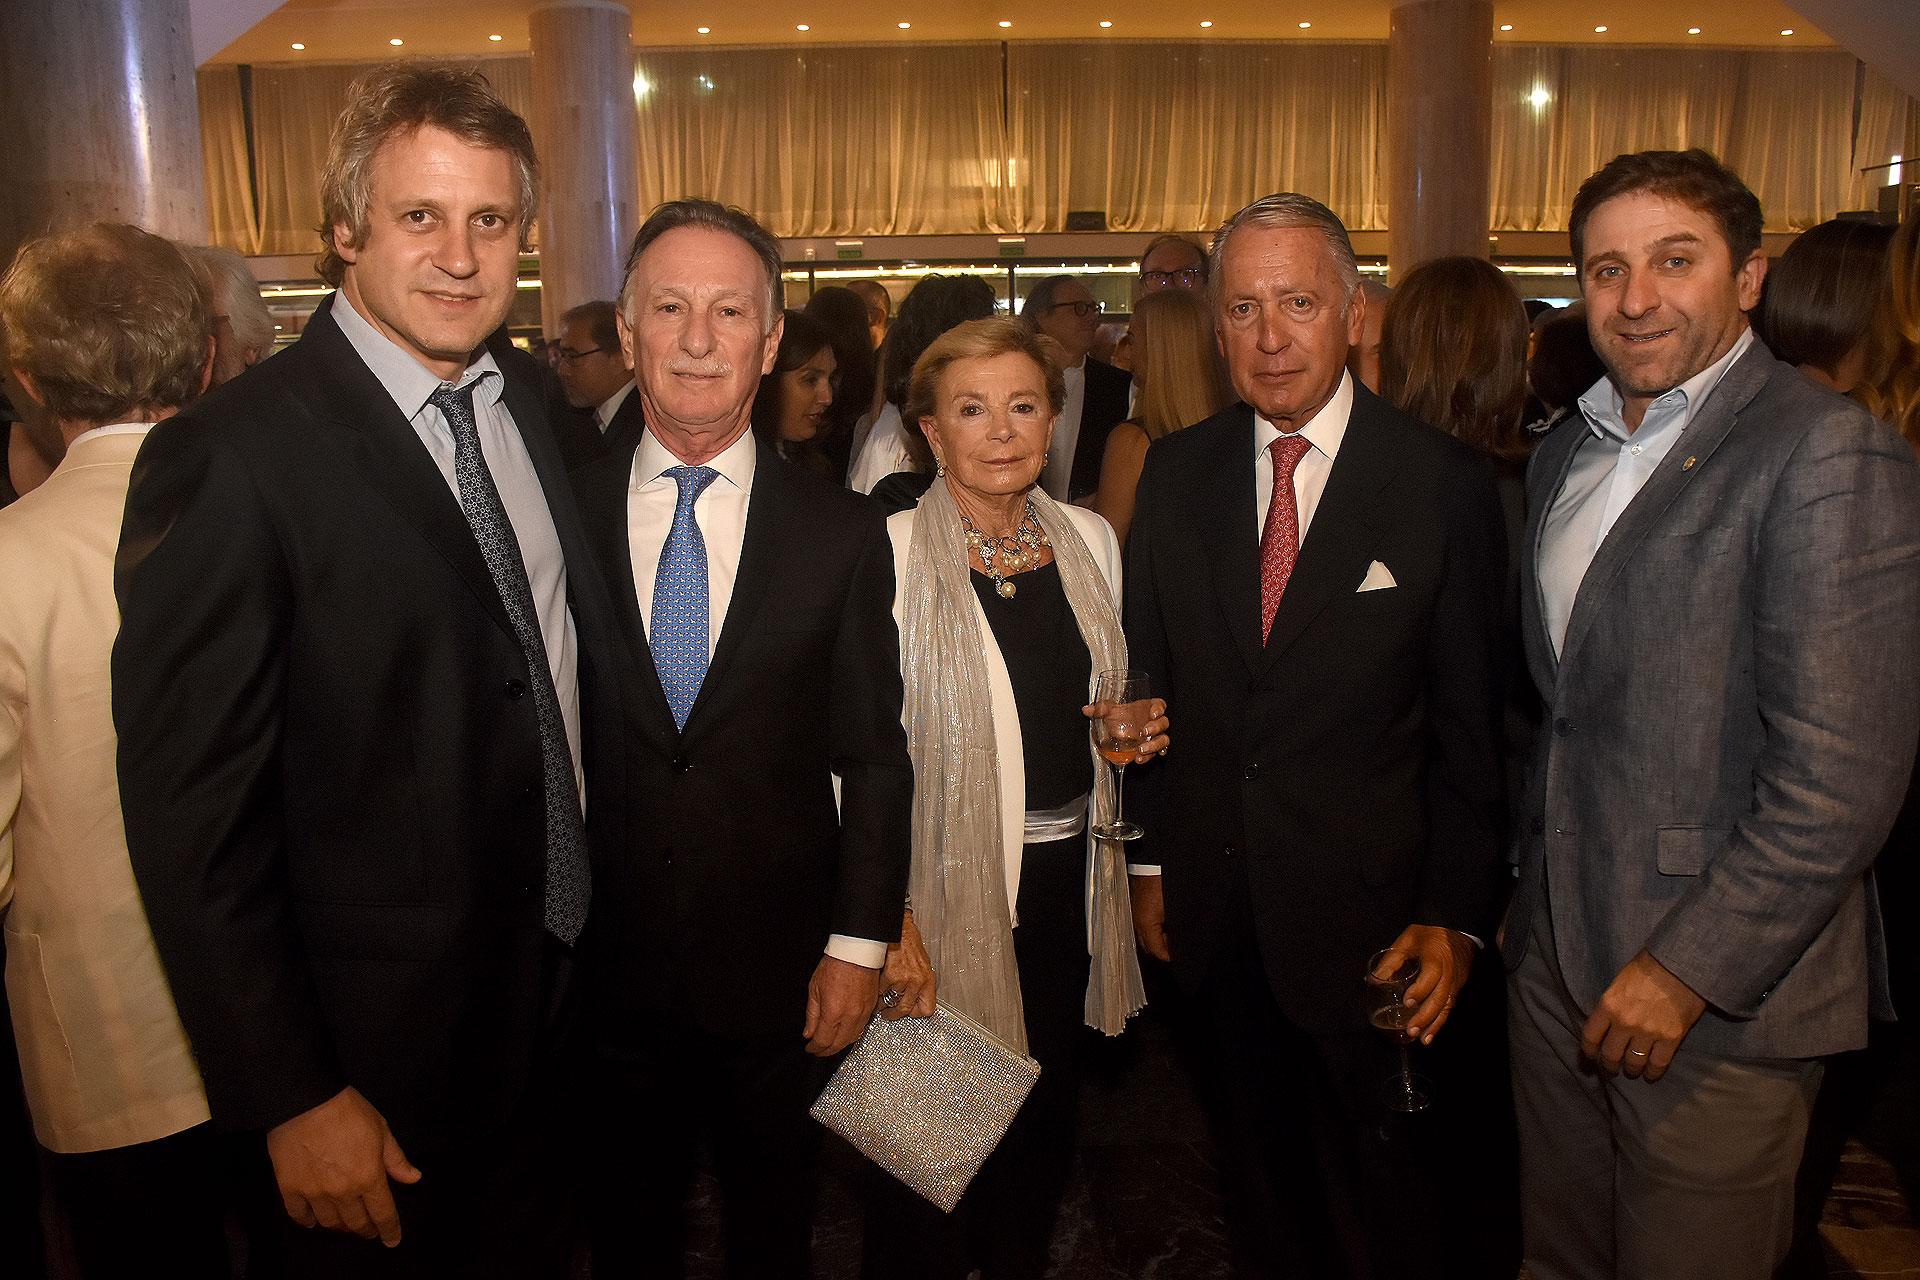 Felipe Miguel, Gustavo Weiss, Daniel Funes de Rioja (presidente de la COPAL) y Fernando Straface